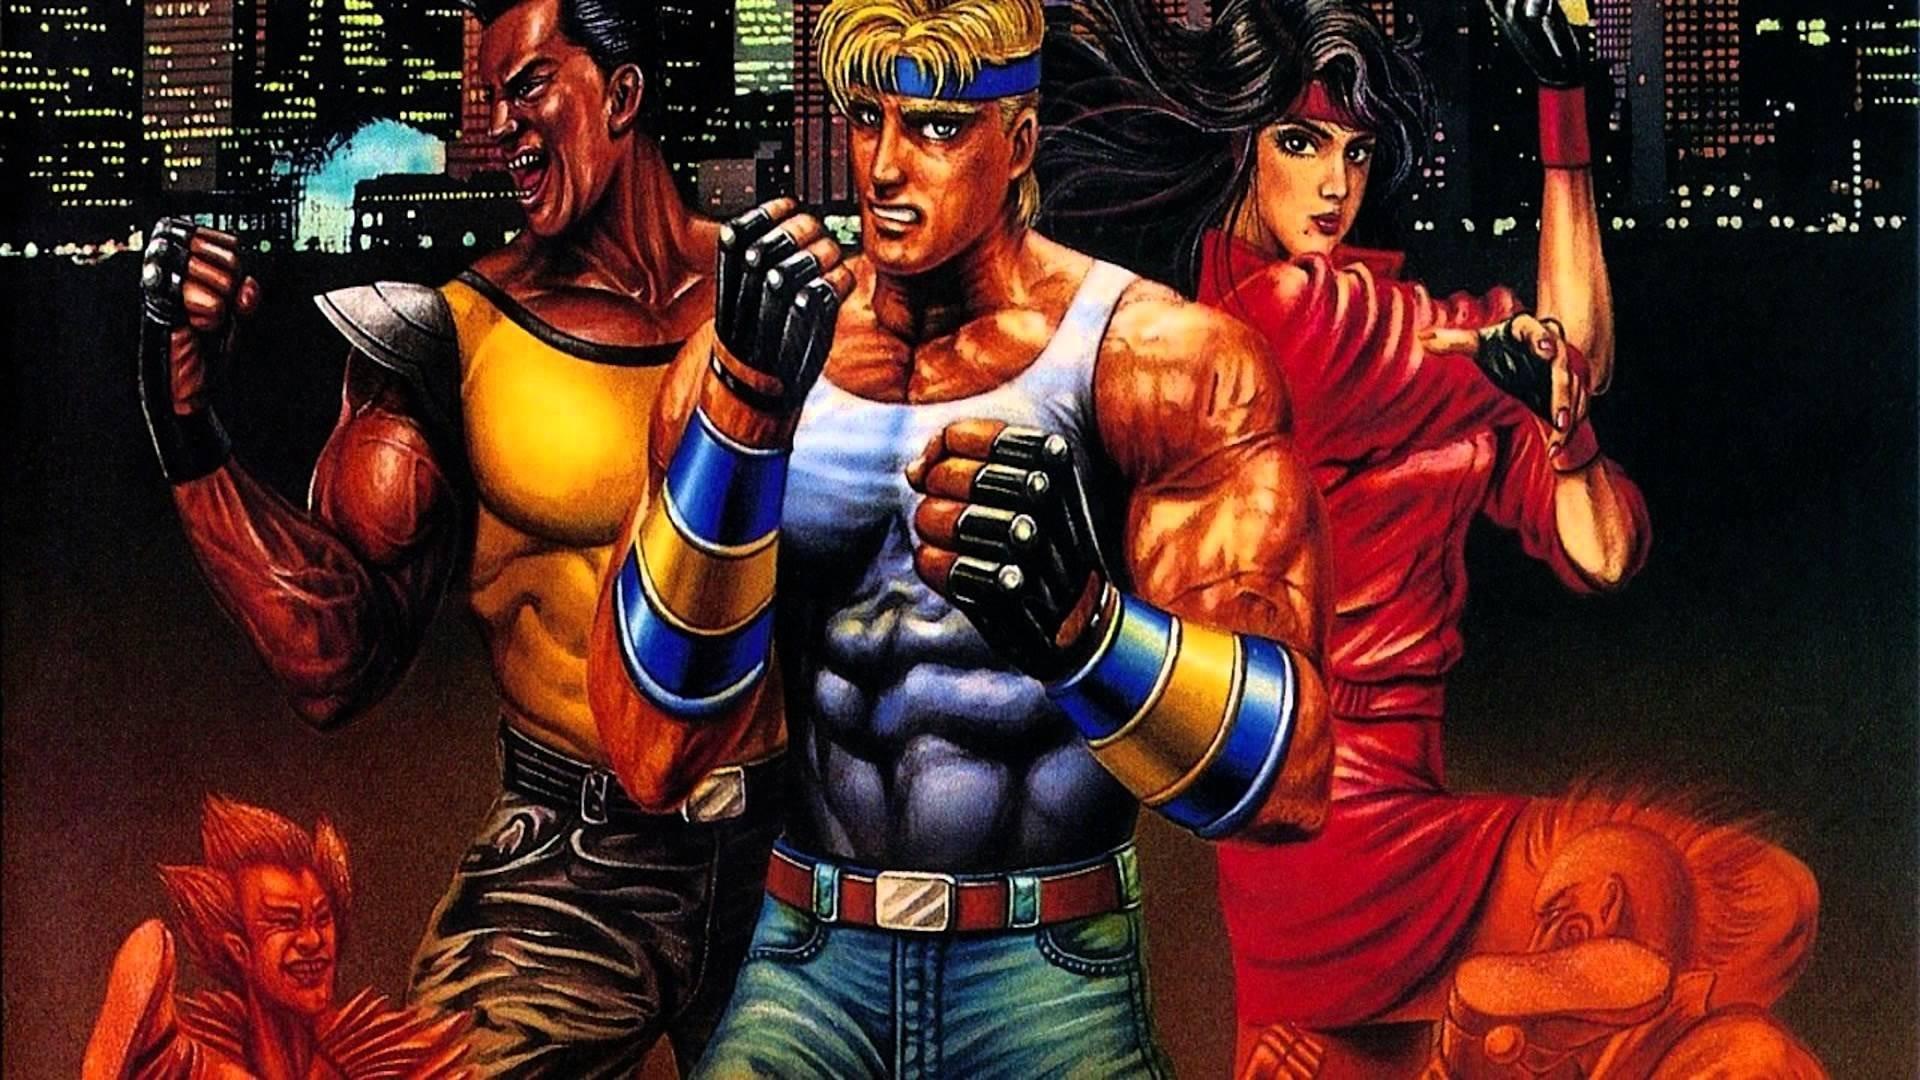 STREETS Of RAGE Ikari no Tekken action fighting arena scrolling wrestling  boxing martial 1sor nintendo sega wallpaper | | 626229 |  WallpaperUP